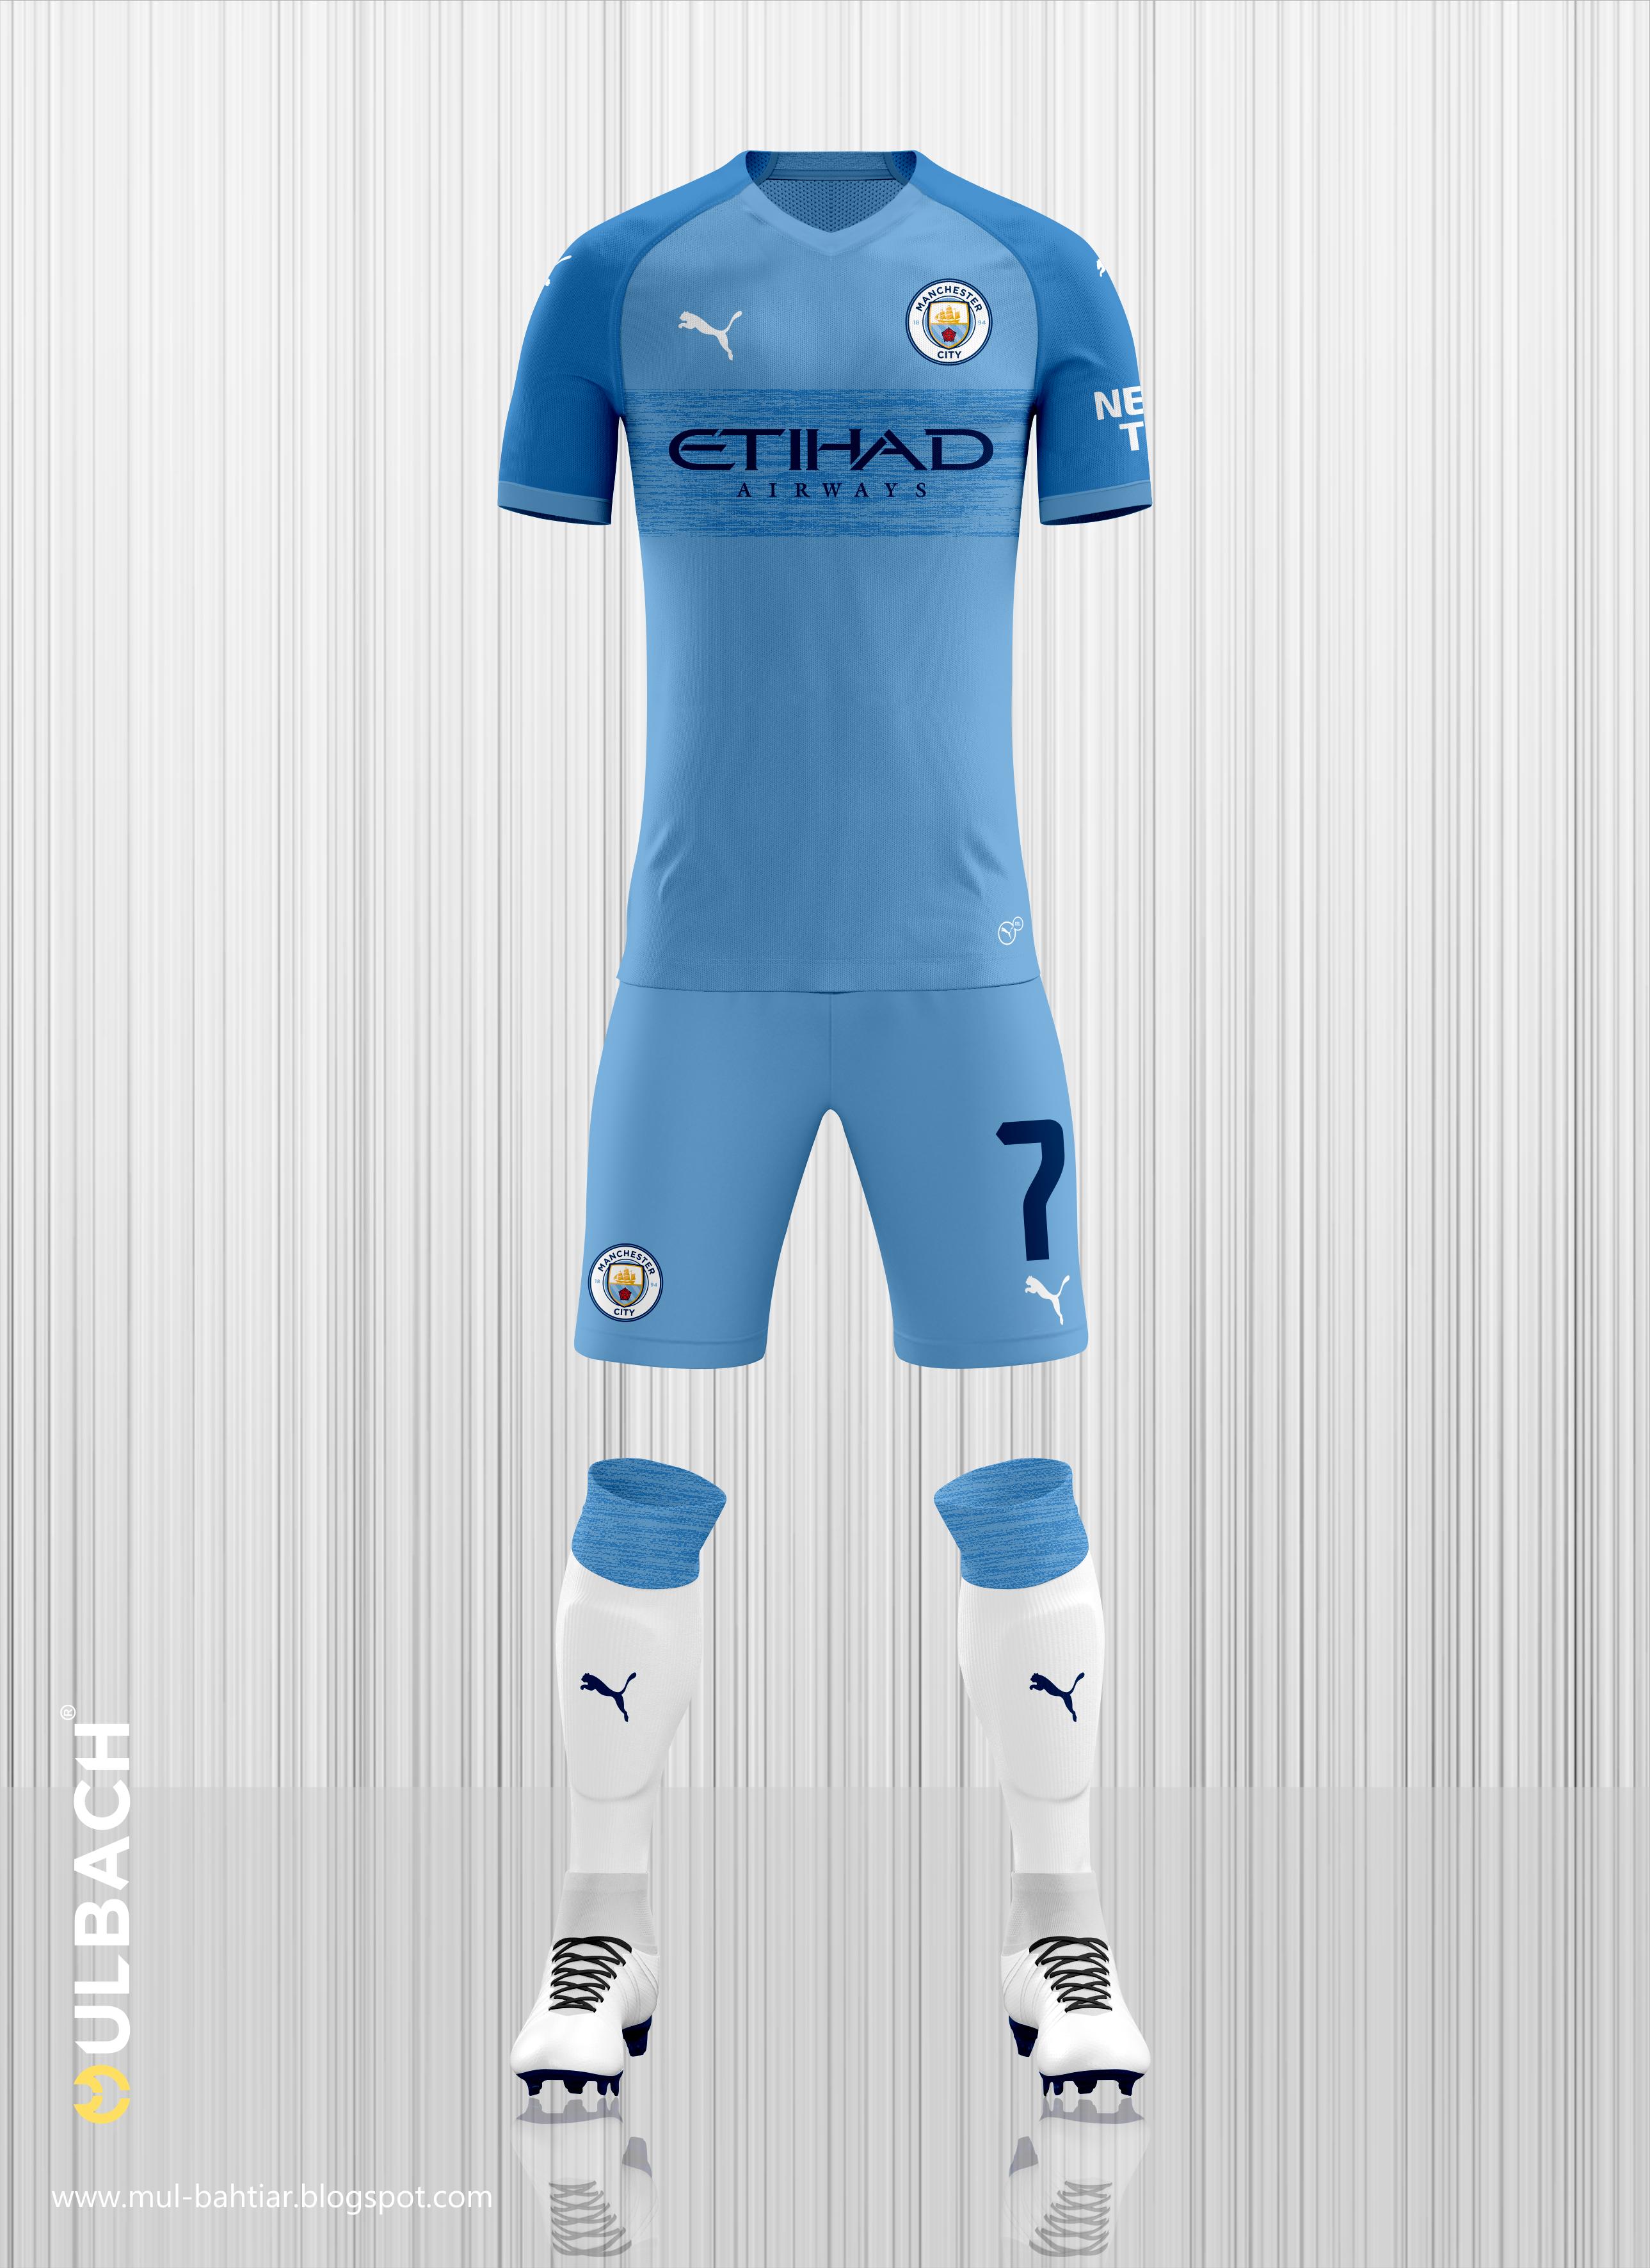 641b9879773fa Manchester City 2019 2020 Puma Kits Concept on Behance